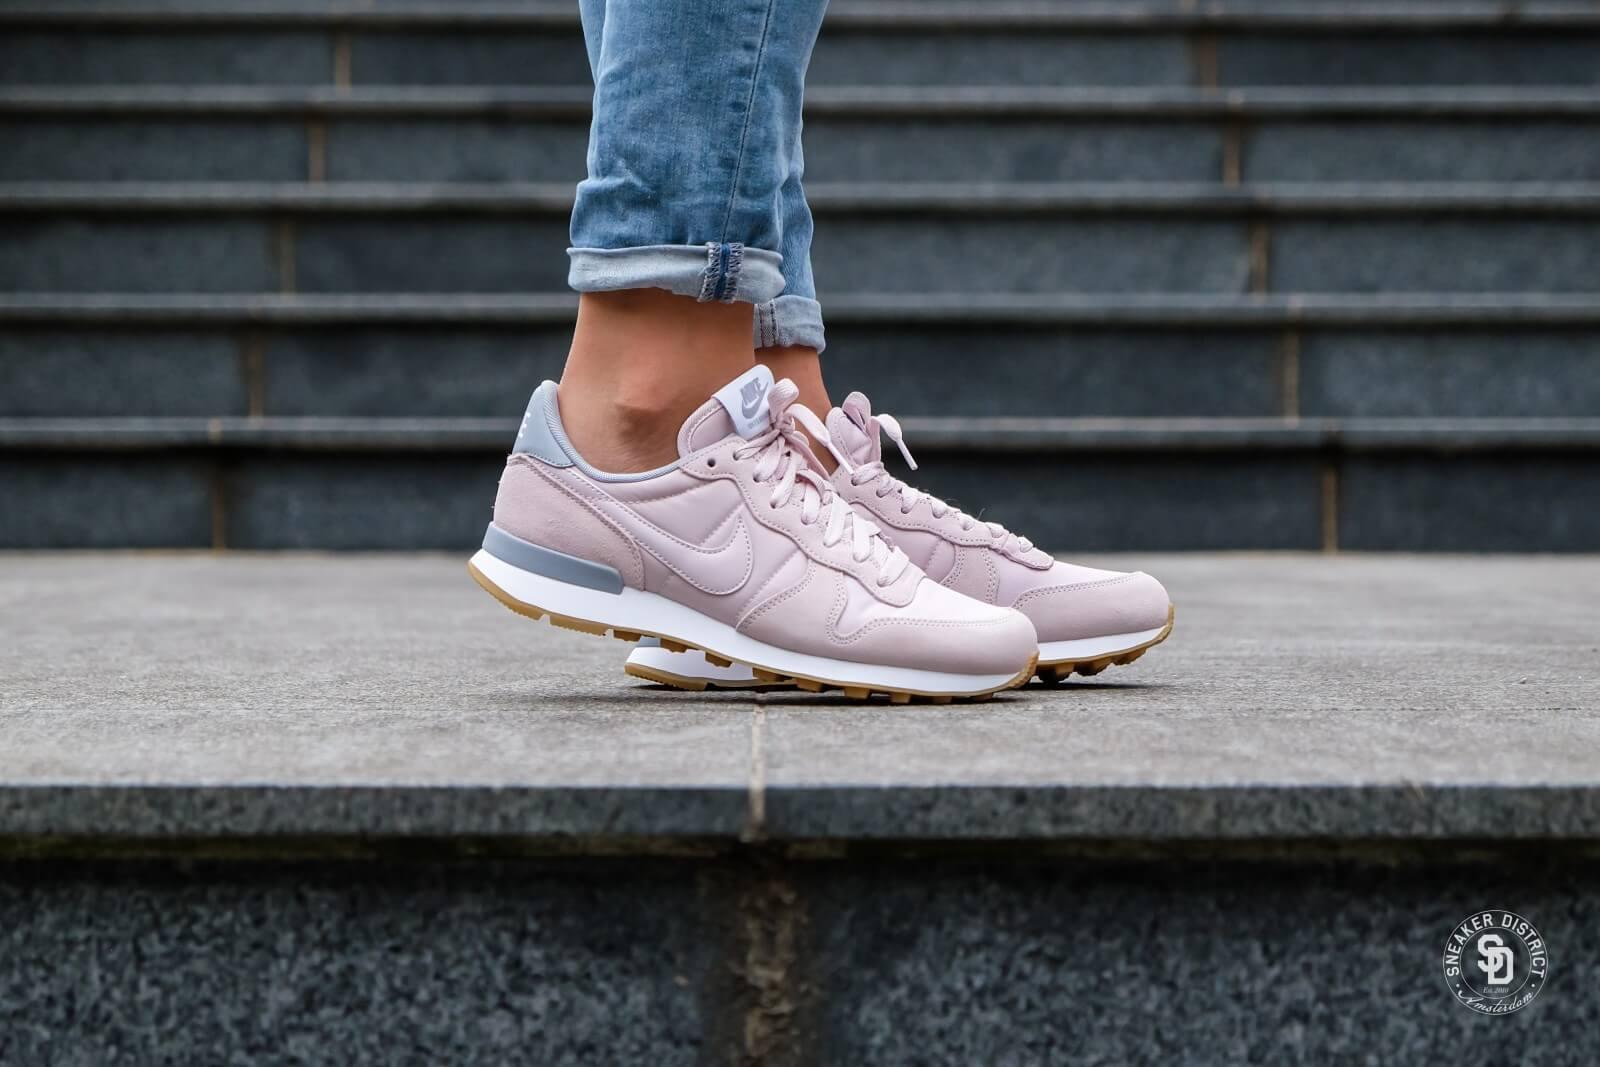 basket nike internationalist femme rose gris,Chaussures NIKE